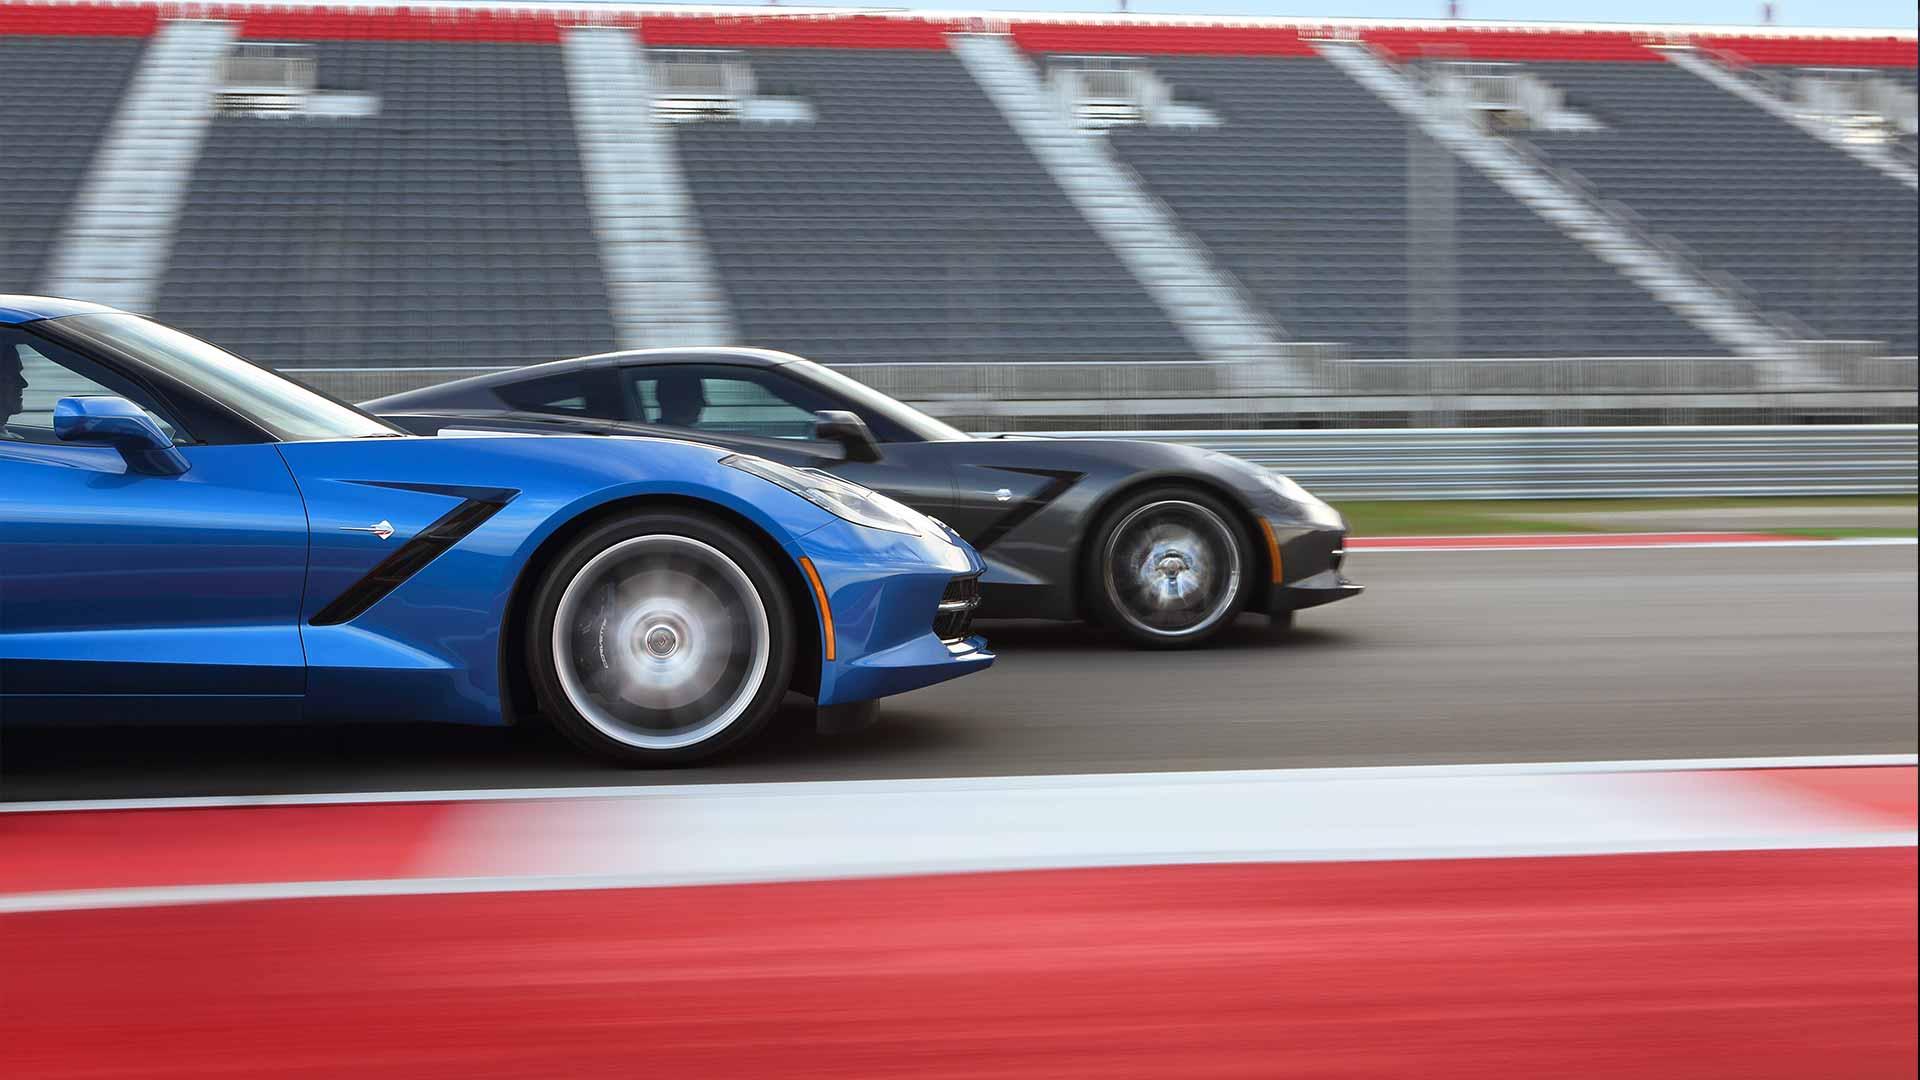 2014-chevrolet-corvette-coupe-photo-videos-exterior-stage-1920x1080-10